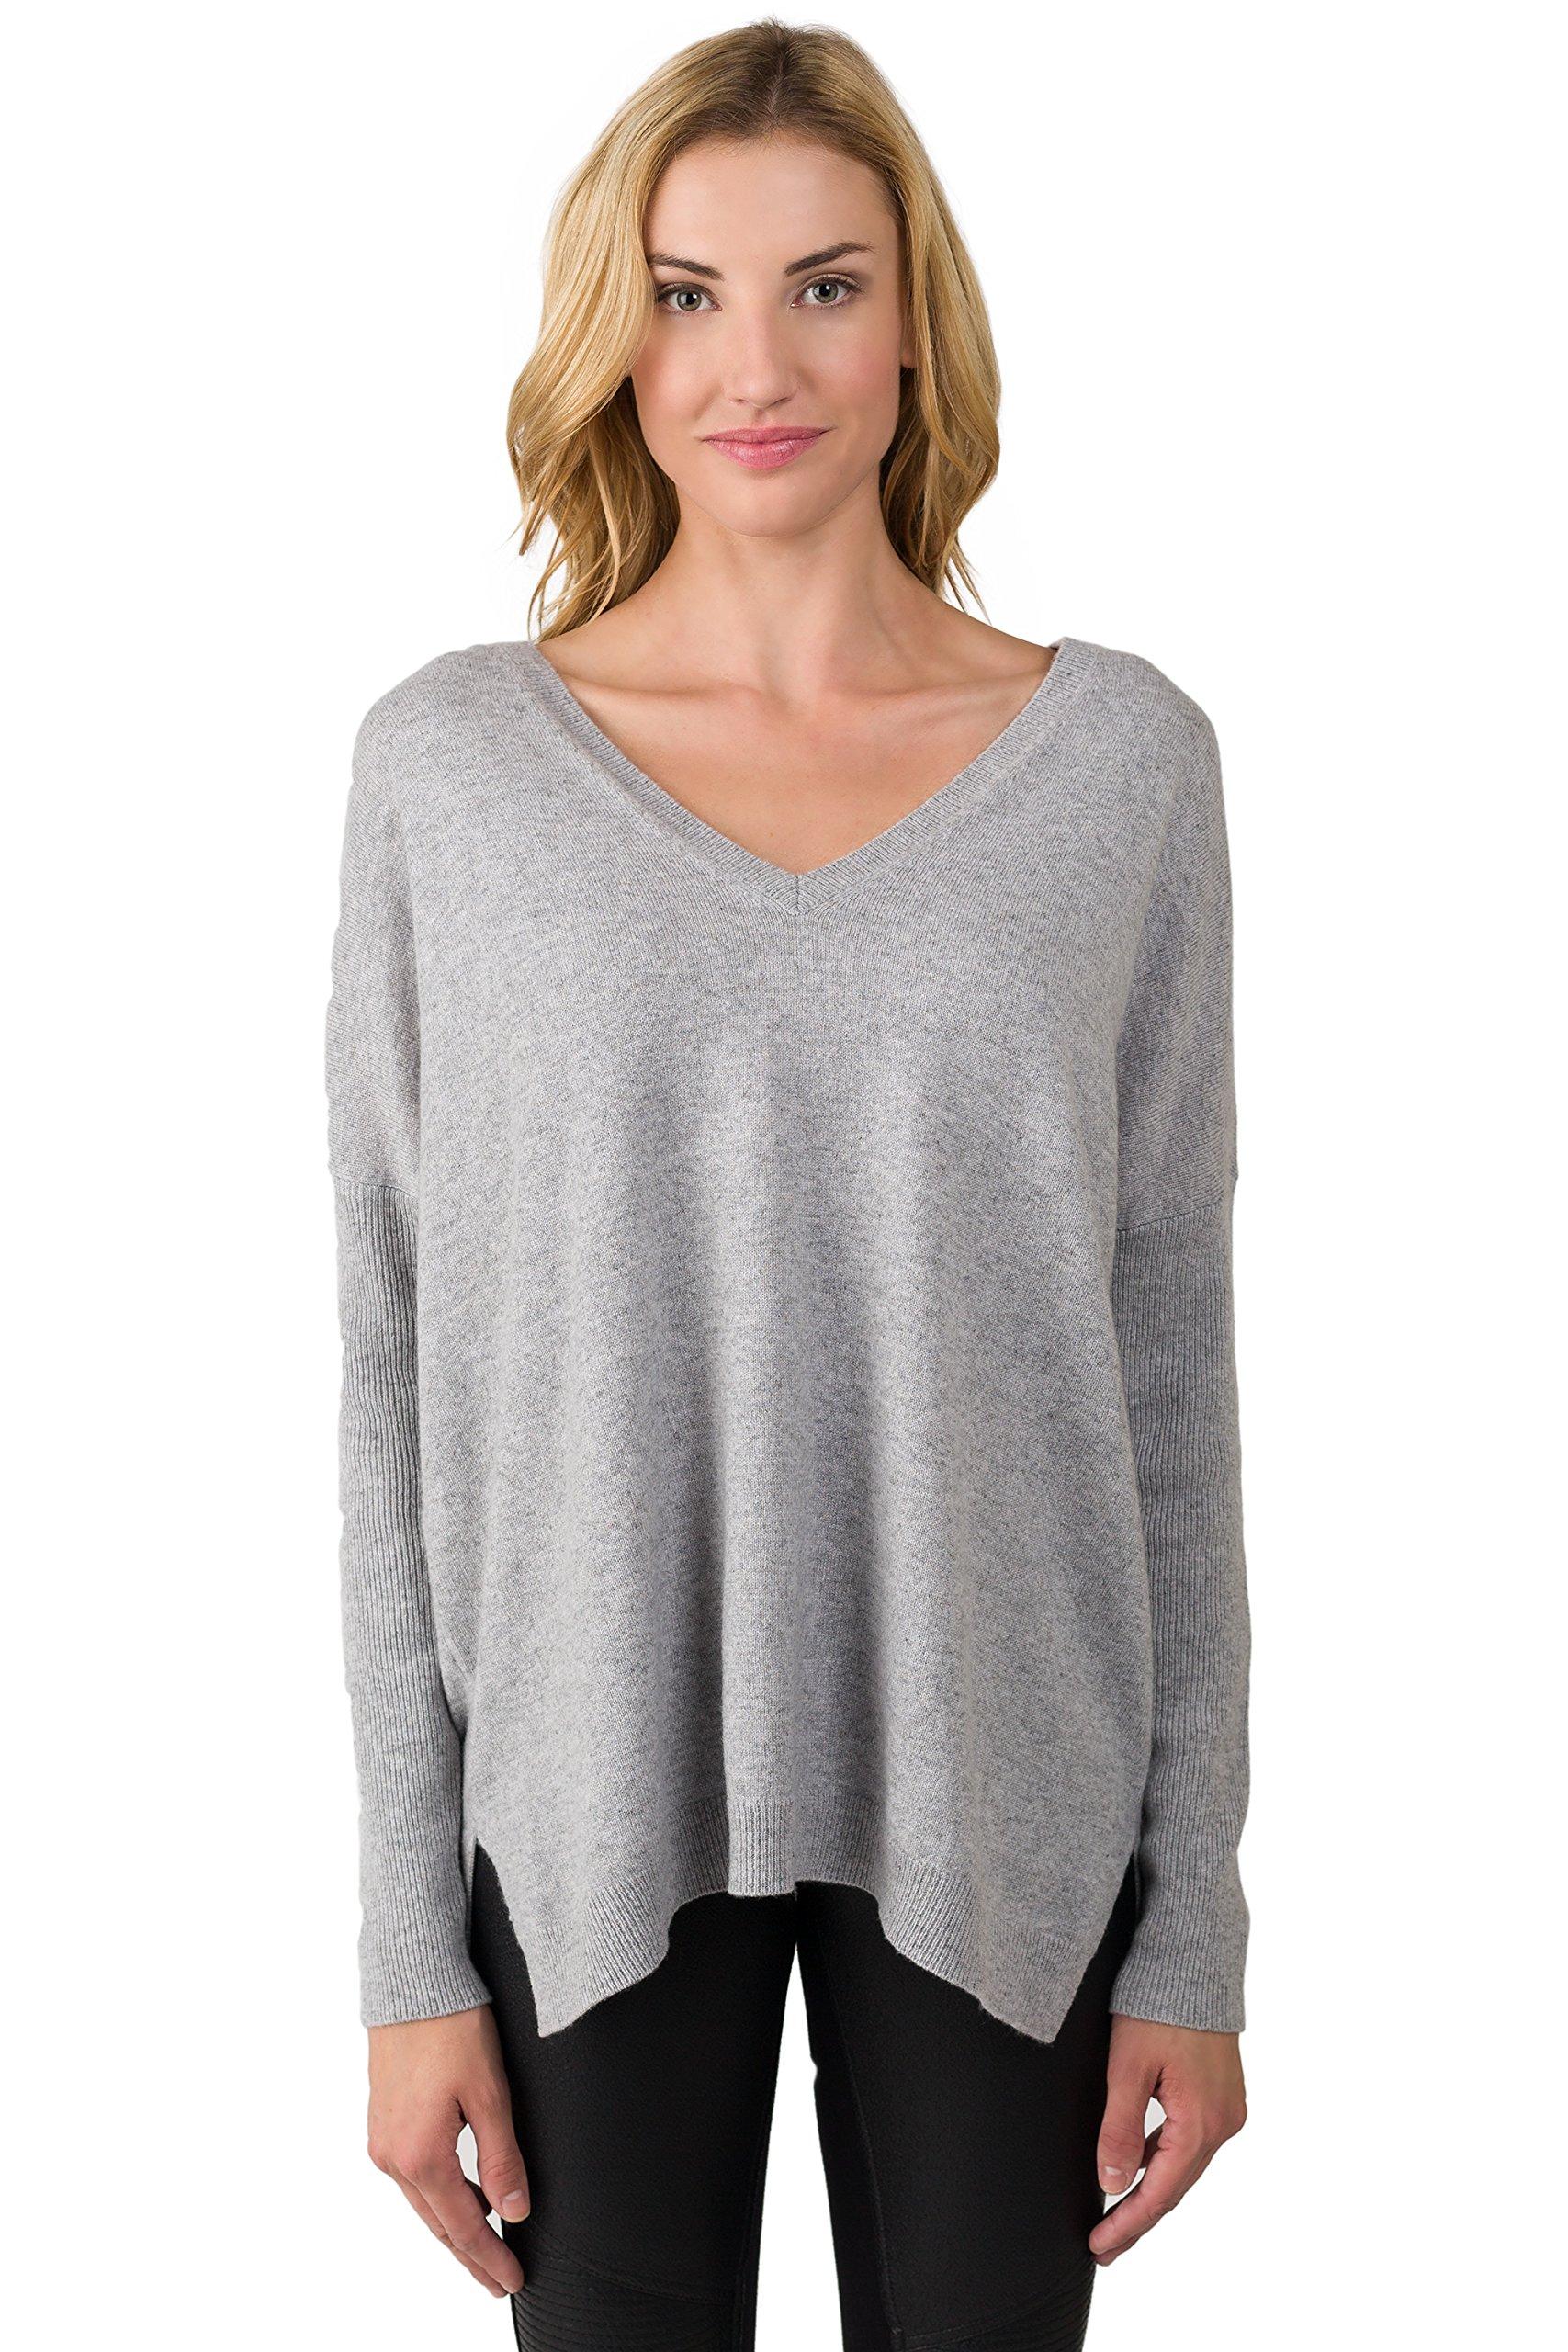 J CASHMERE Women's 100% Cashmere Long Sleeve Oversize Double V Dolman Sweater Grey medium